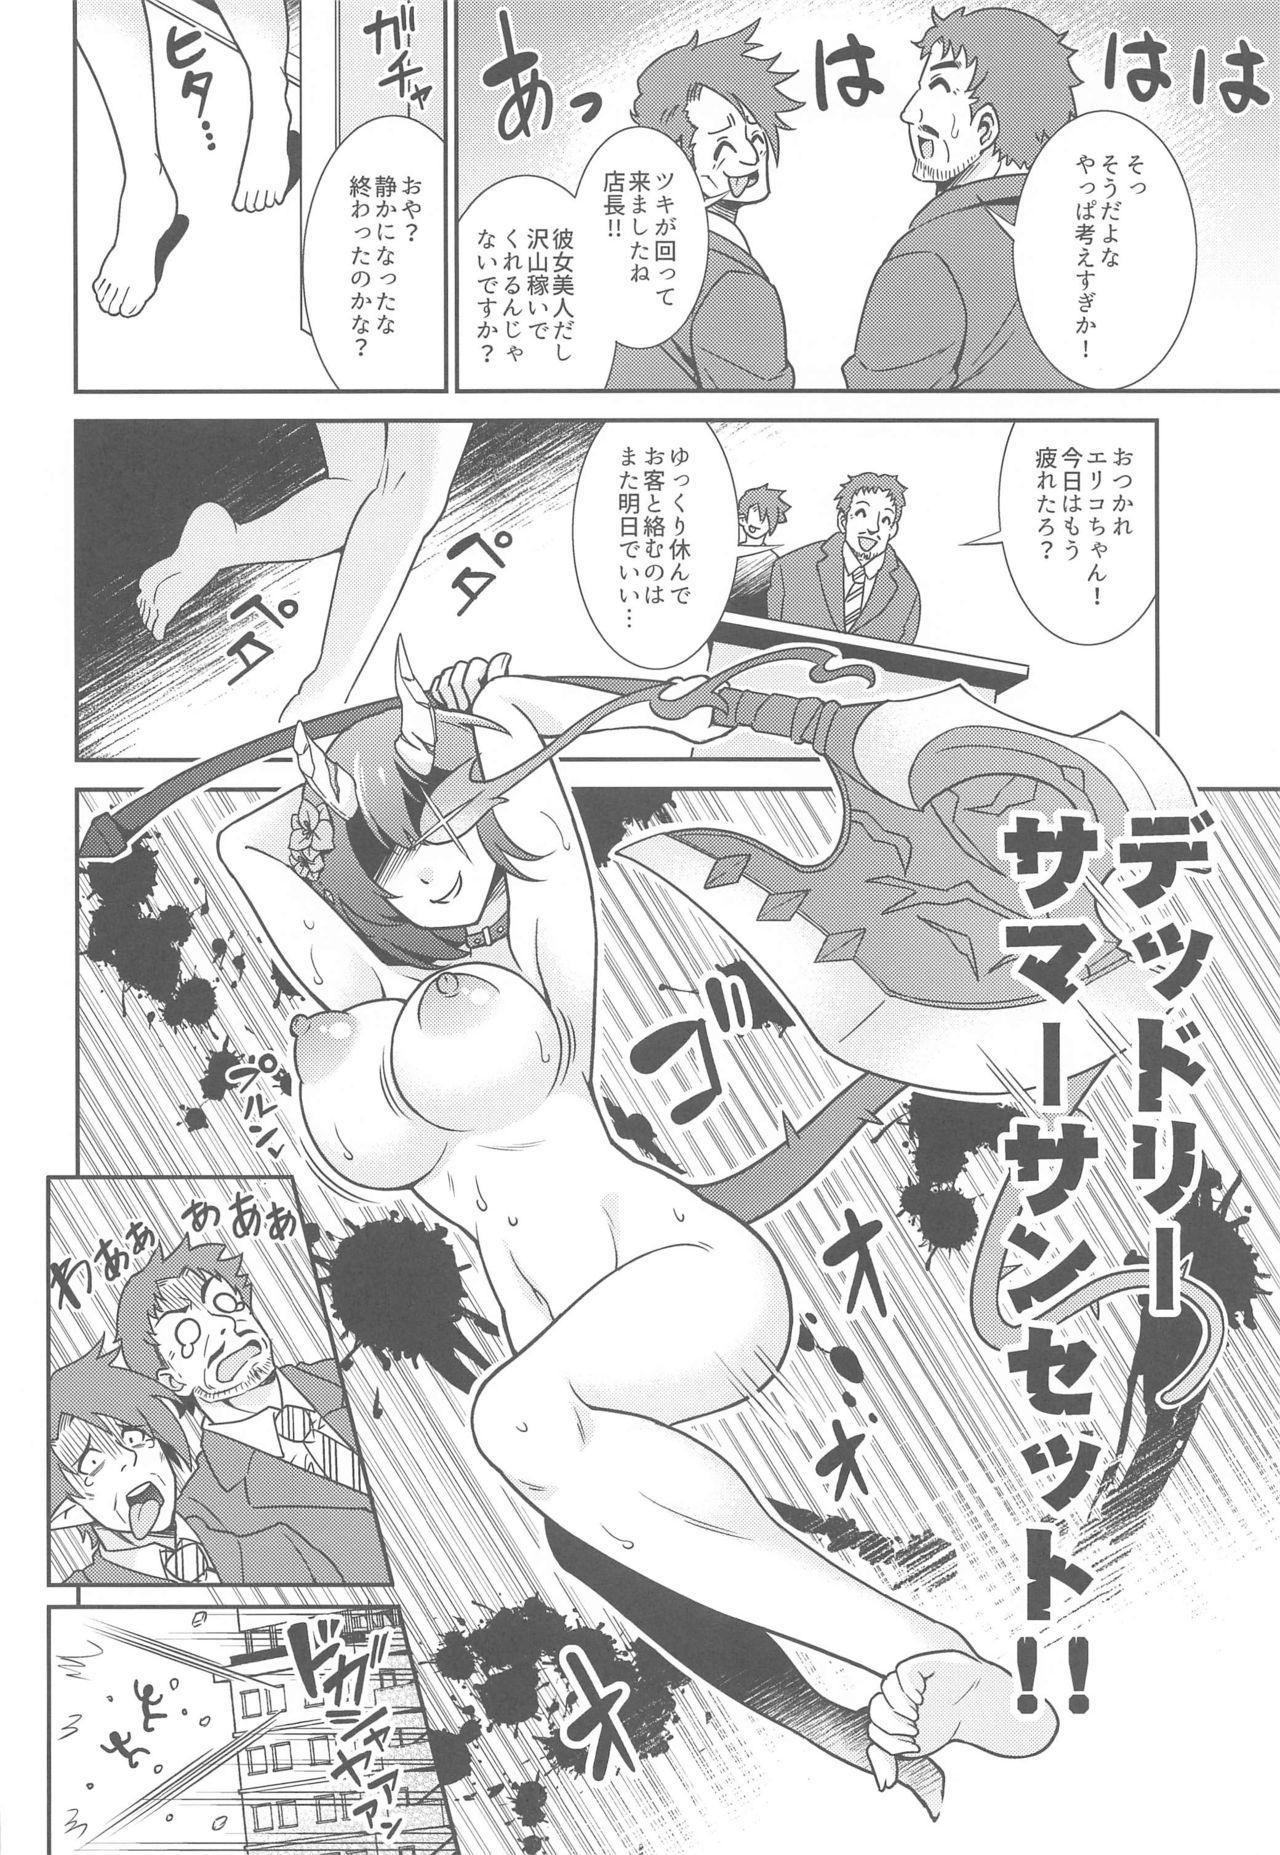 (Mega MBFes TOKYO in Tokyo Ryuutsuu Center) [Kurokoya (Shikigami Kuroko)] Anata-sama Senyou Soap-jou Eriko (Princess Connect! Re:Dive) 24